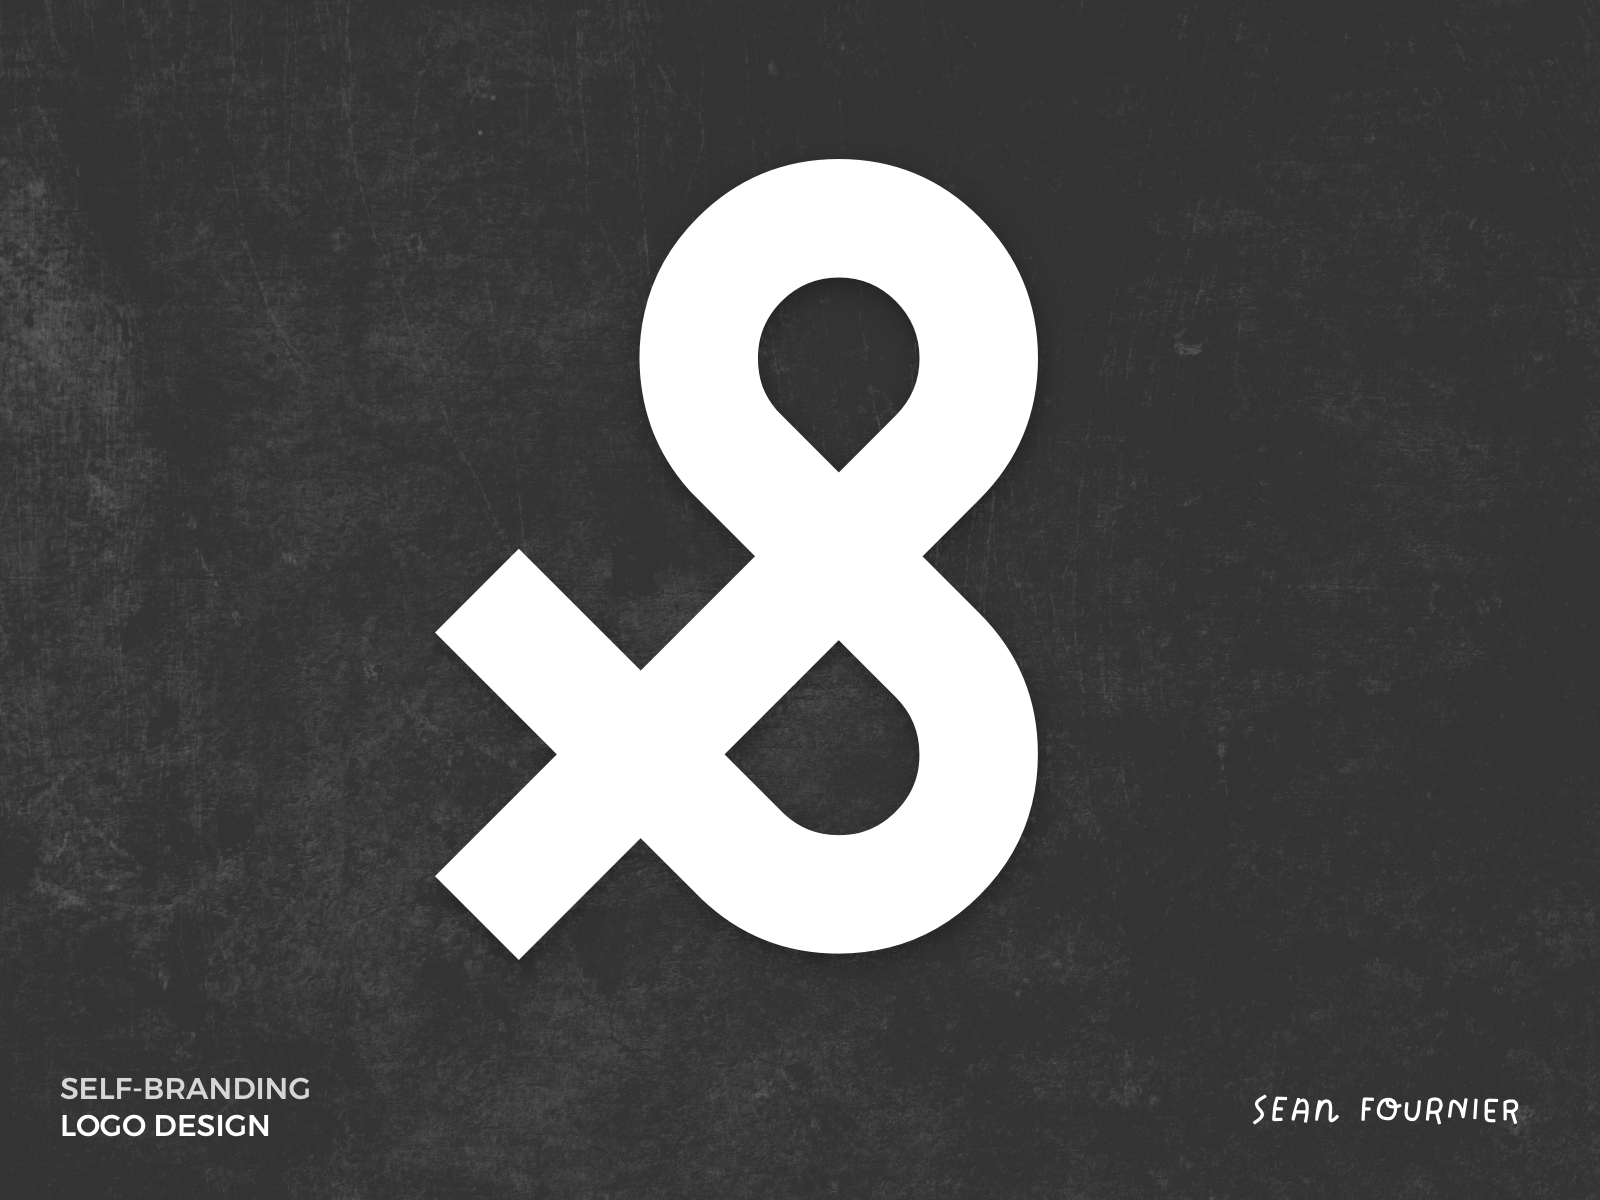 seanf_logoDesign-main.png